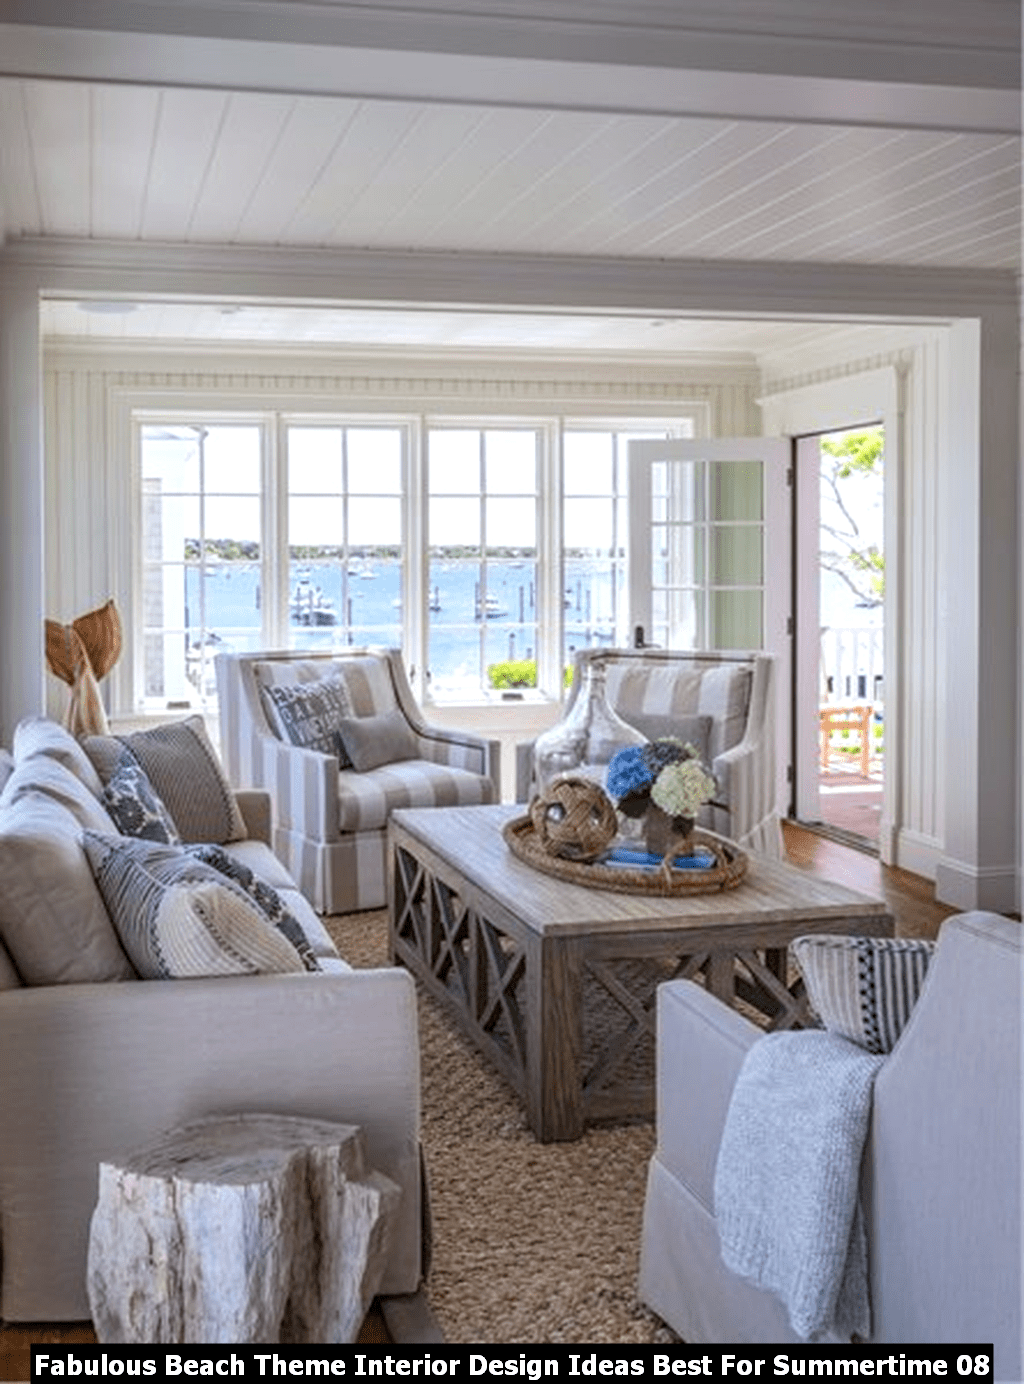 Fabulous Beach Theme Interior Design Ideas Best For Summertime 08